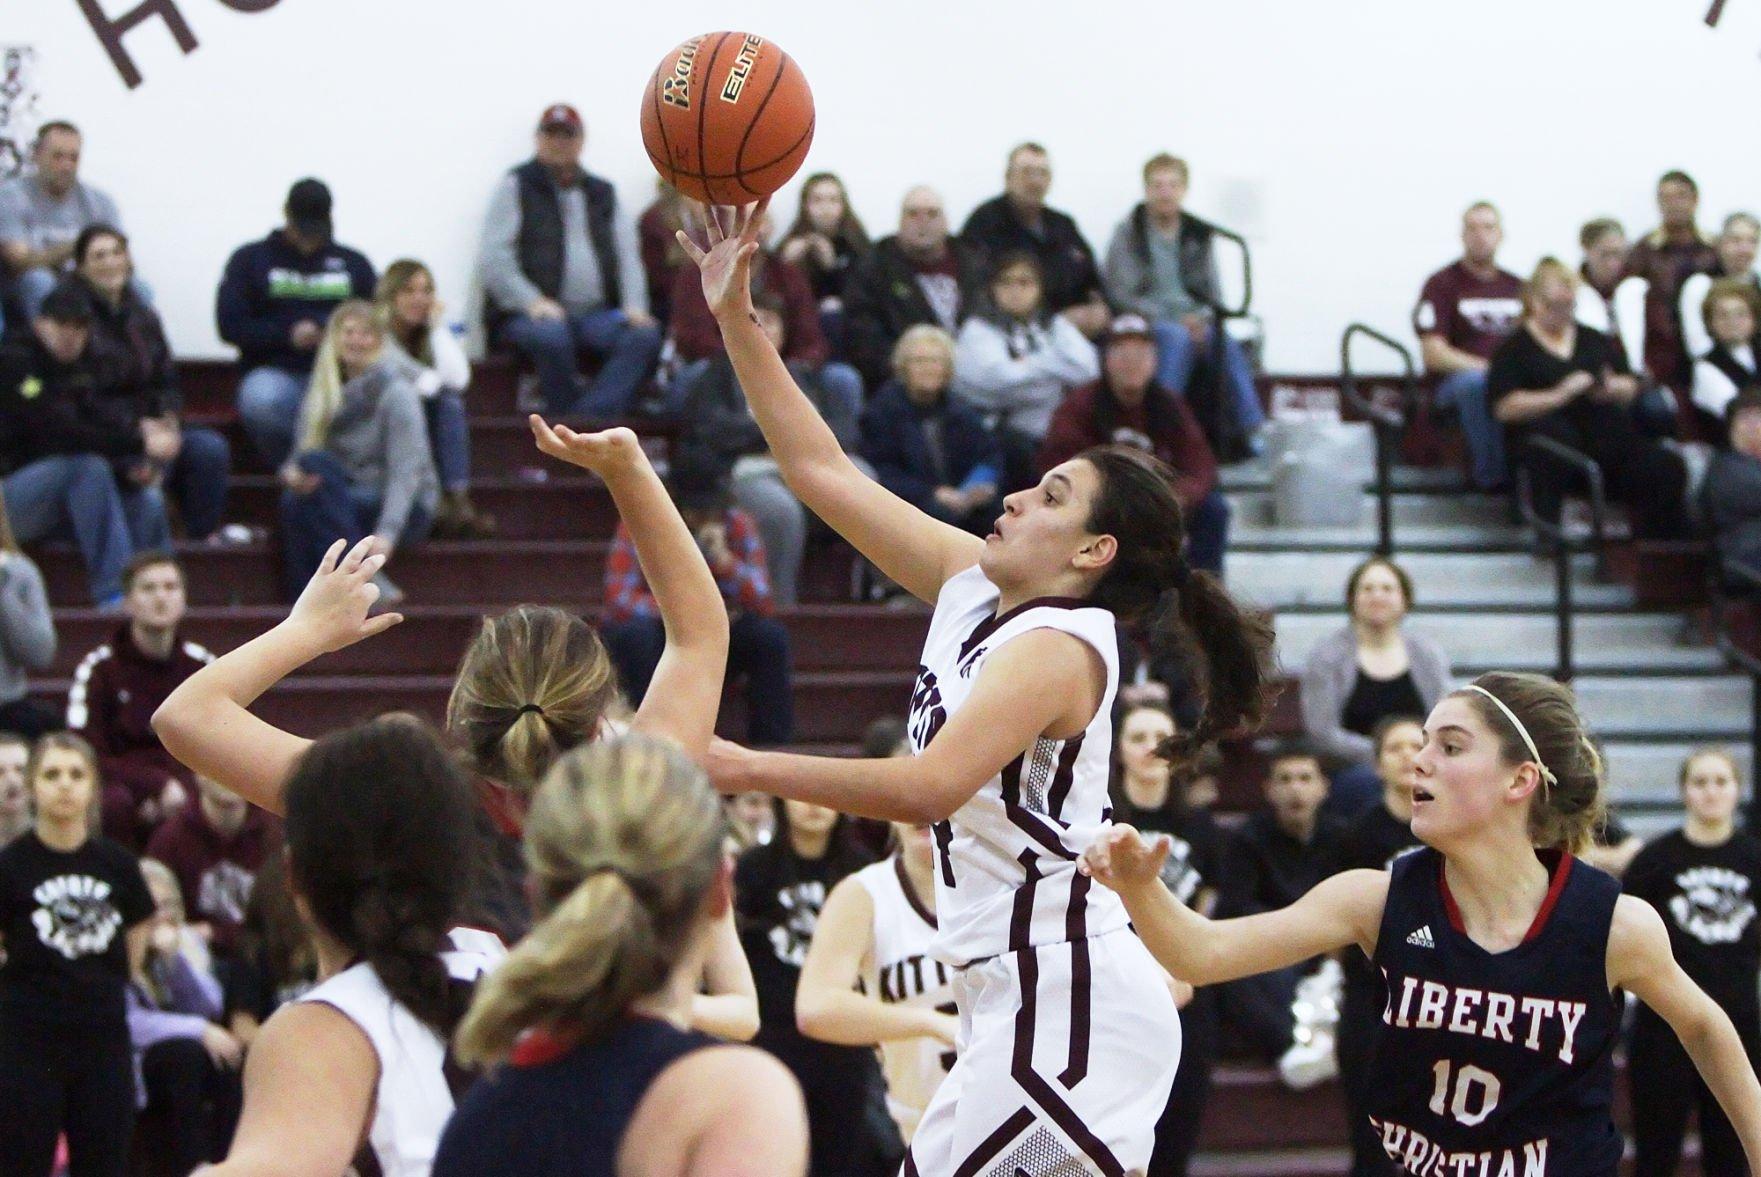 KHS vs Liberty Christian girls basketball Kittitas